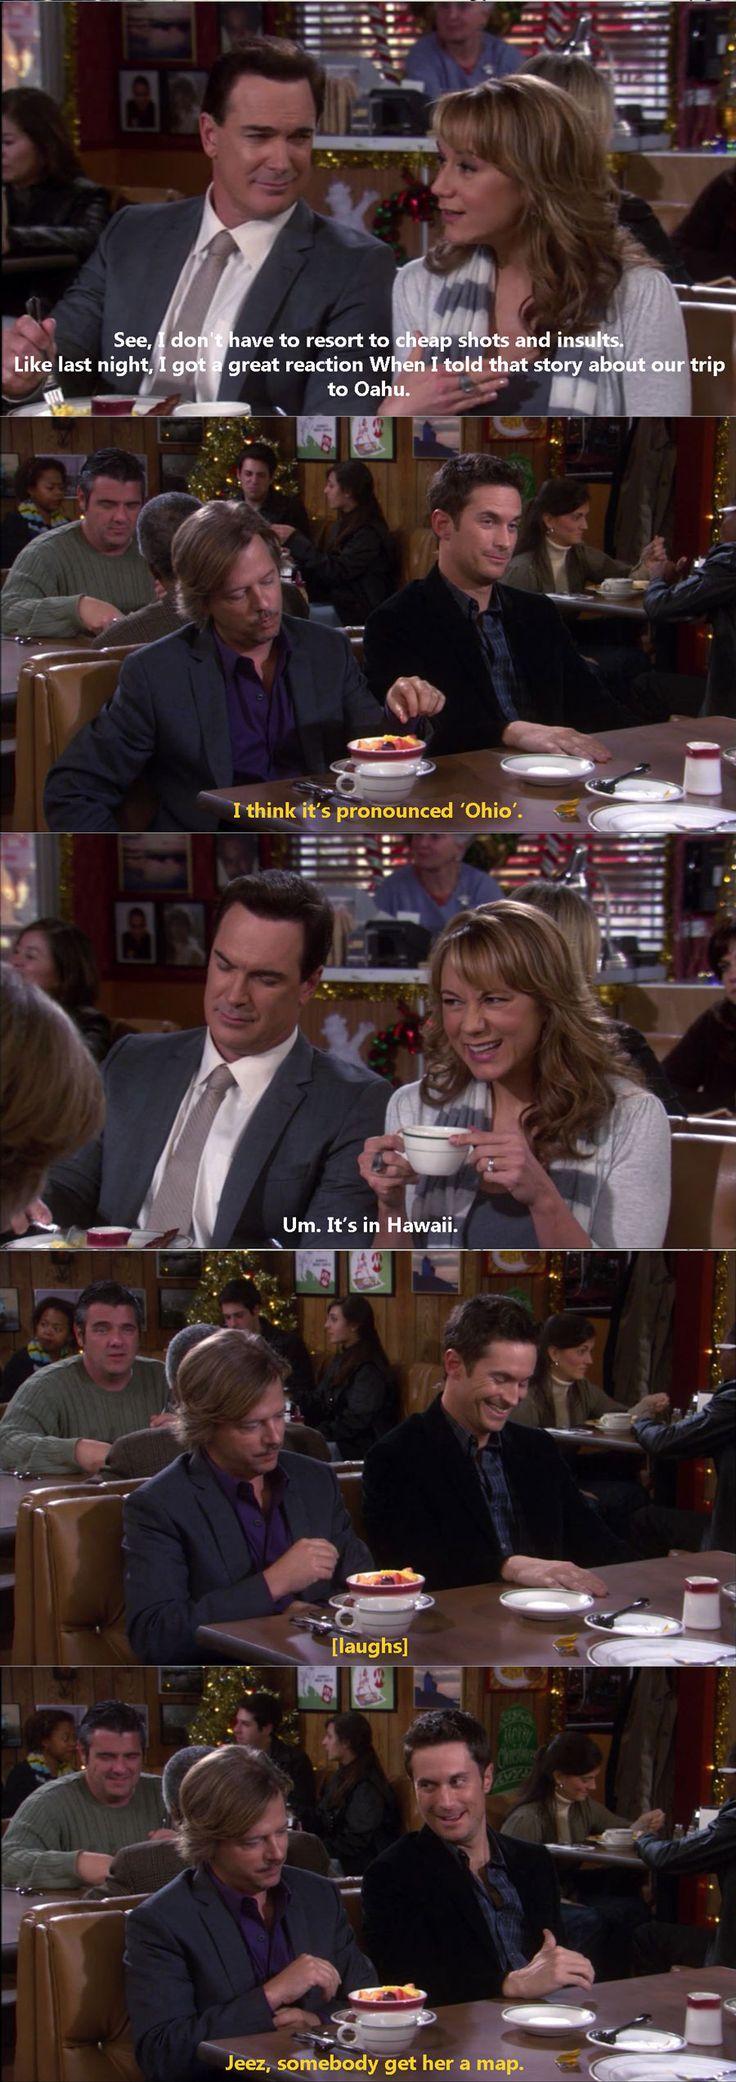 Rules of Engagement - gotta love the cute dumb guy